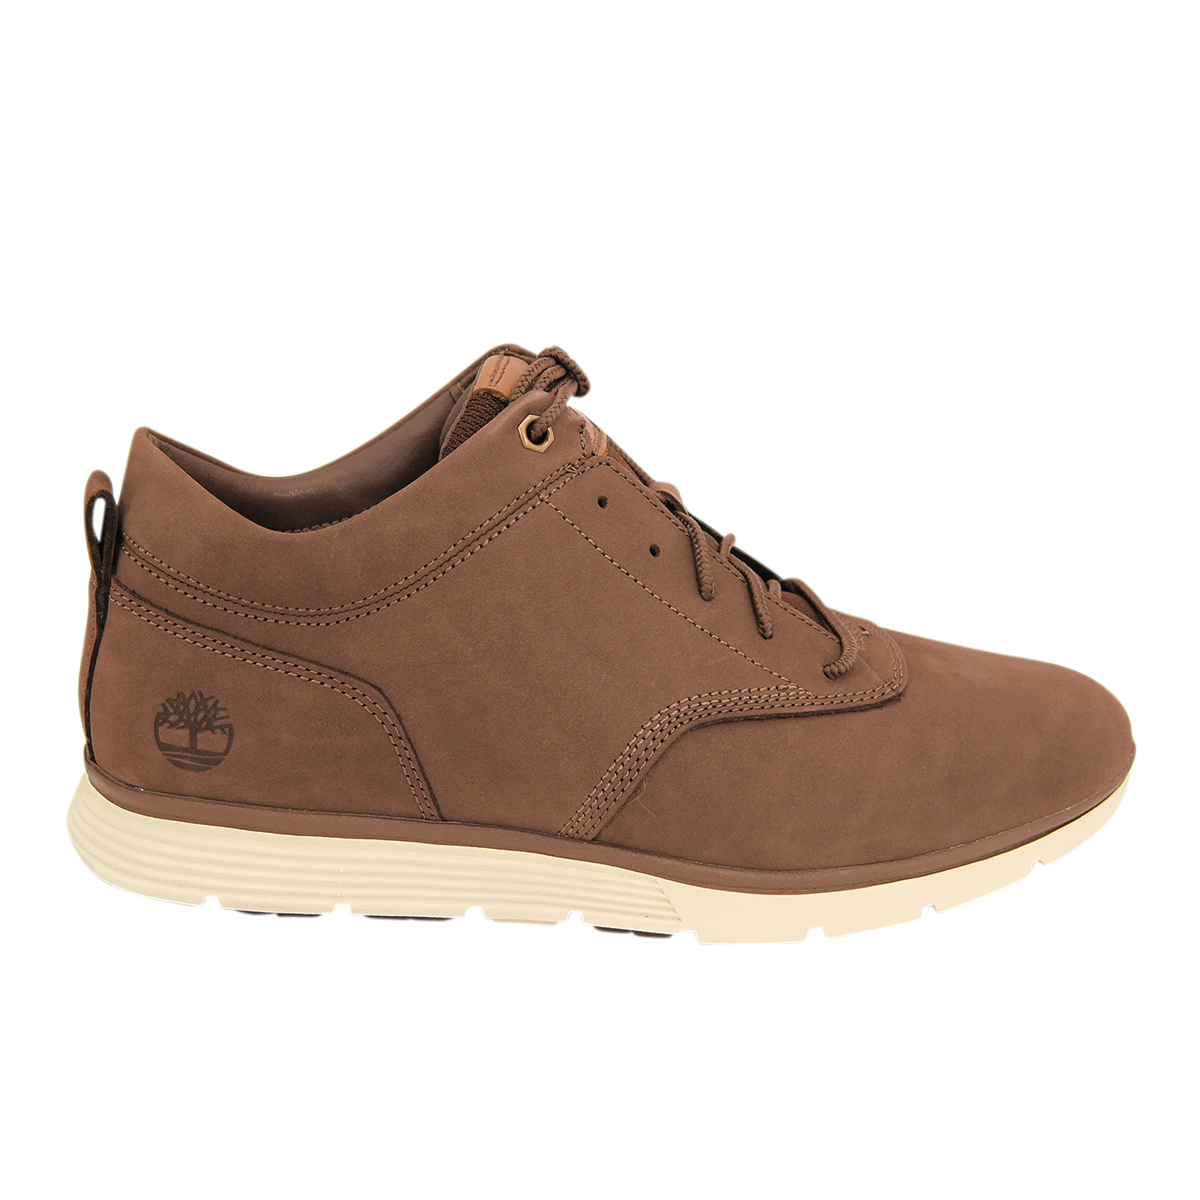 Timberland Killington halfcab CUIR Chaussures Hommes Neuf